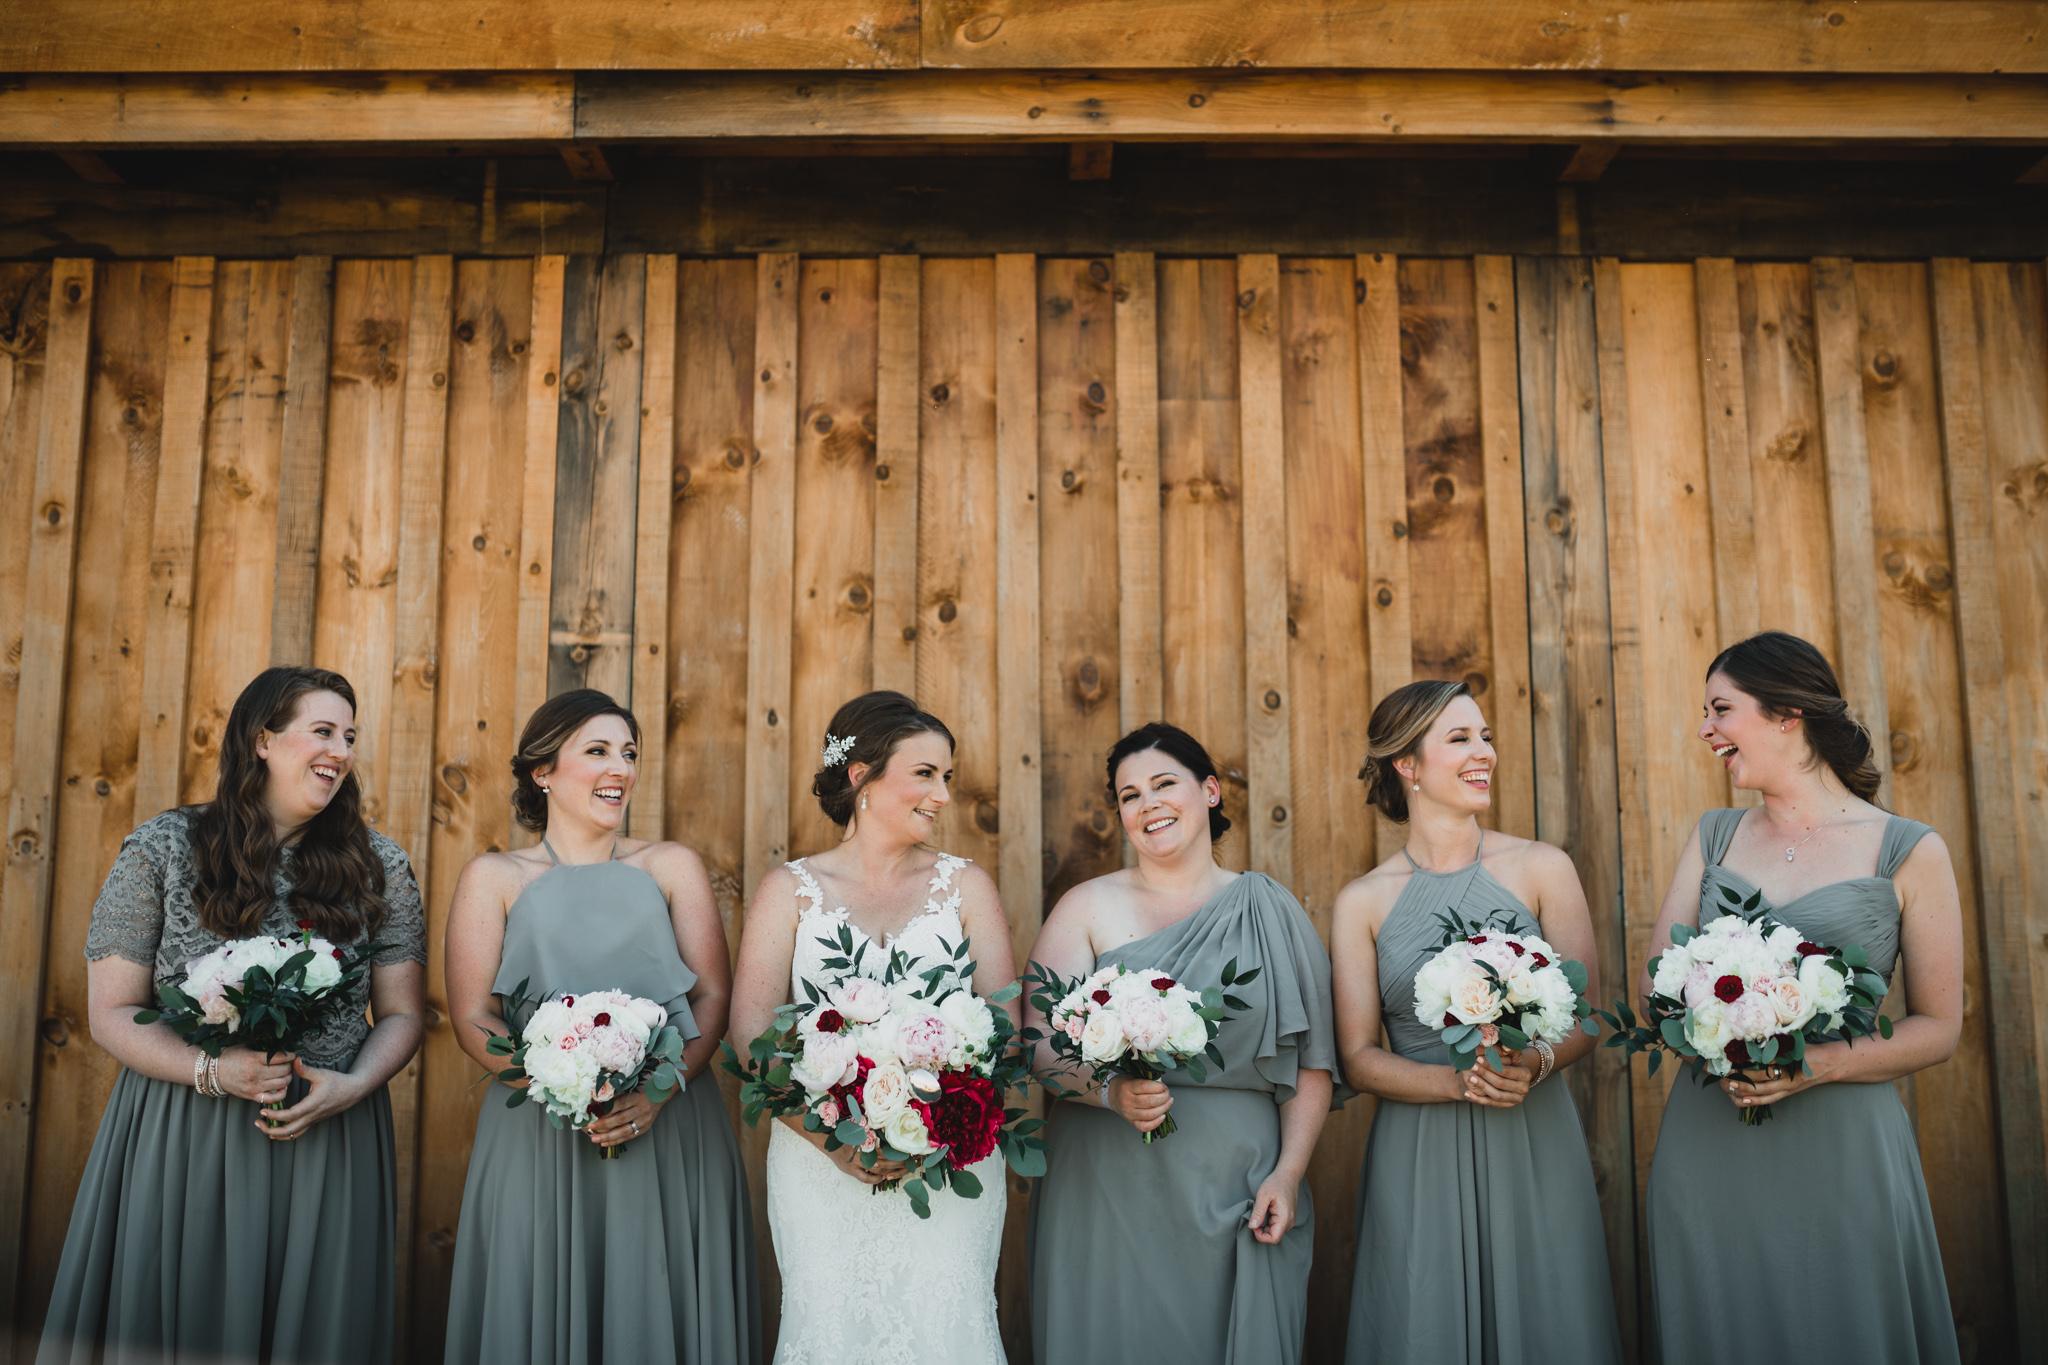 Katriina Kuhn Wedding Photography